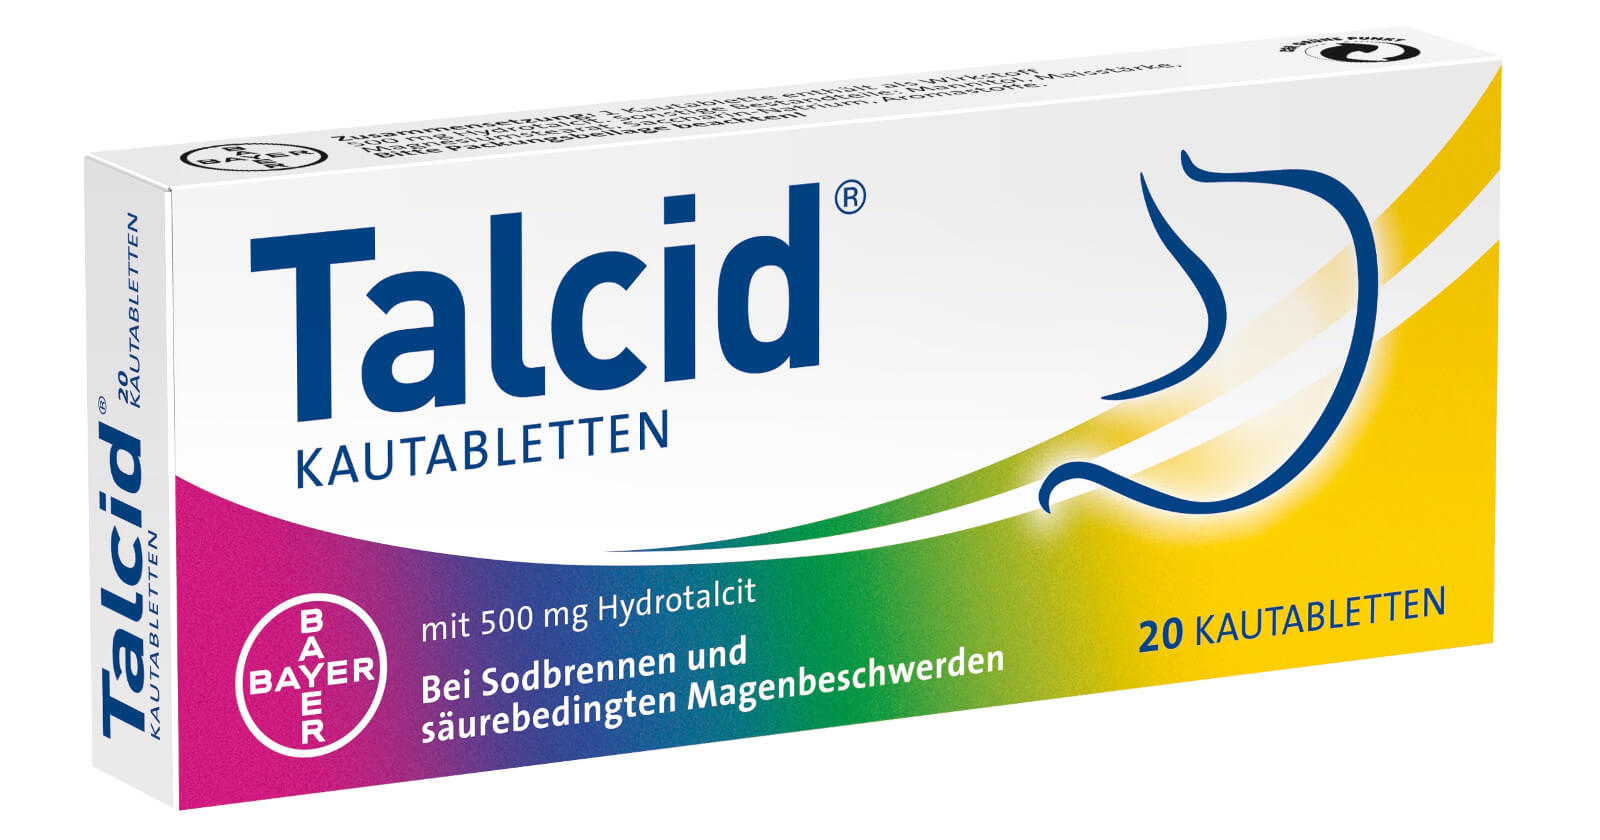 Packshot Talcid Kautabletten